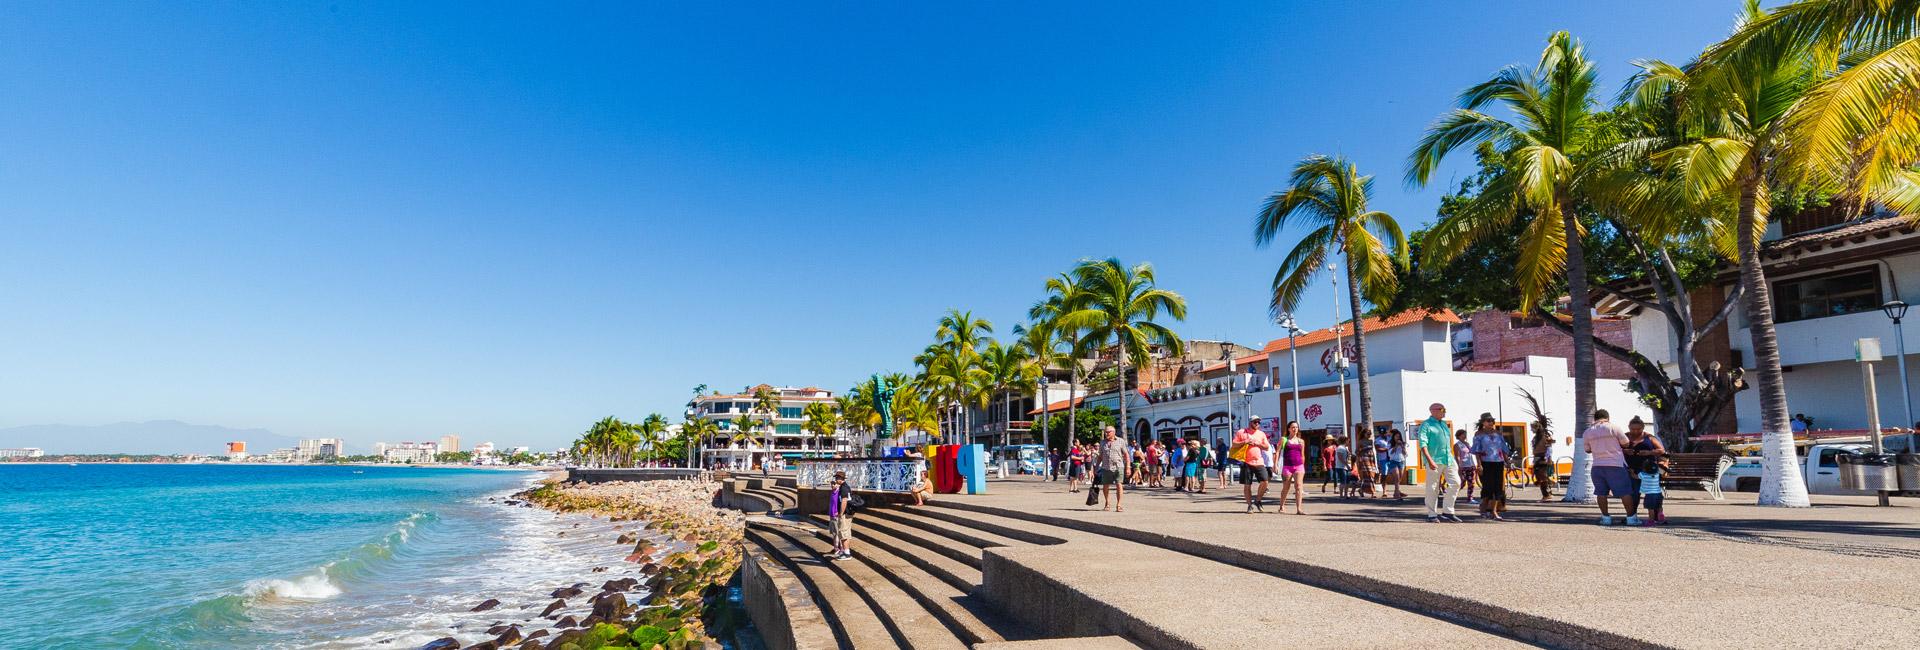 Culture of puerto vallarta